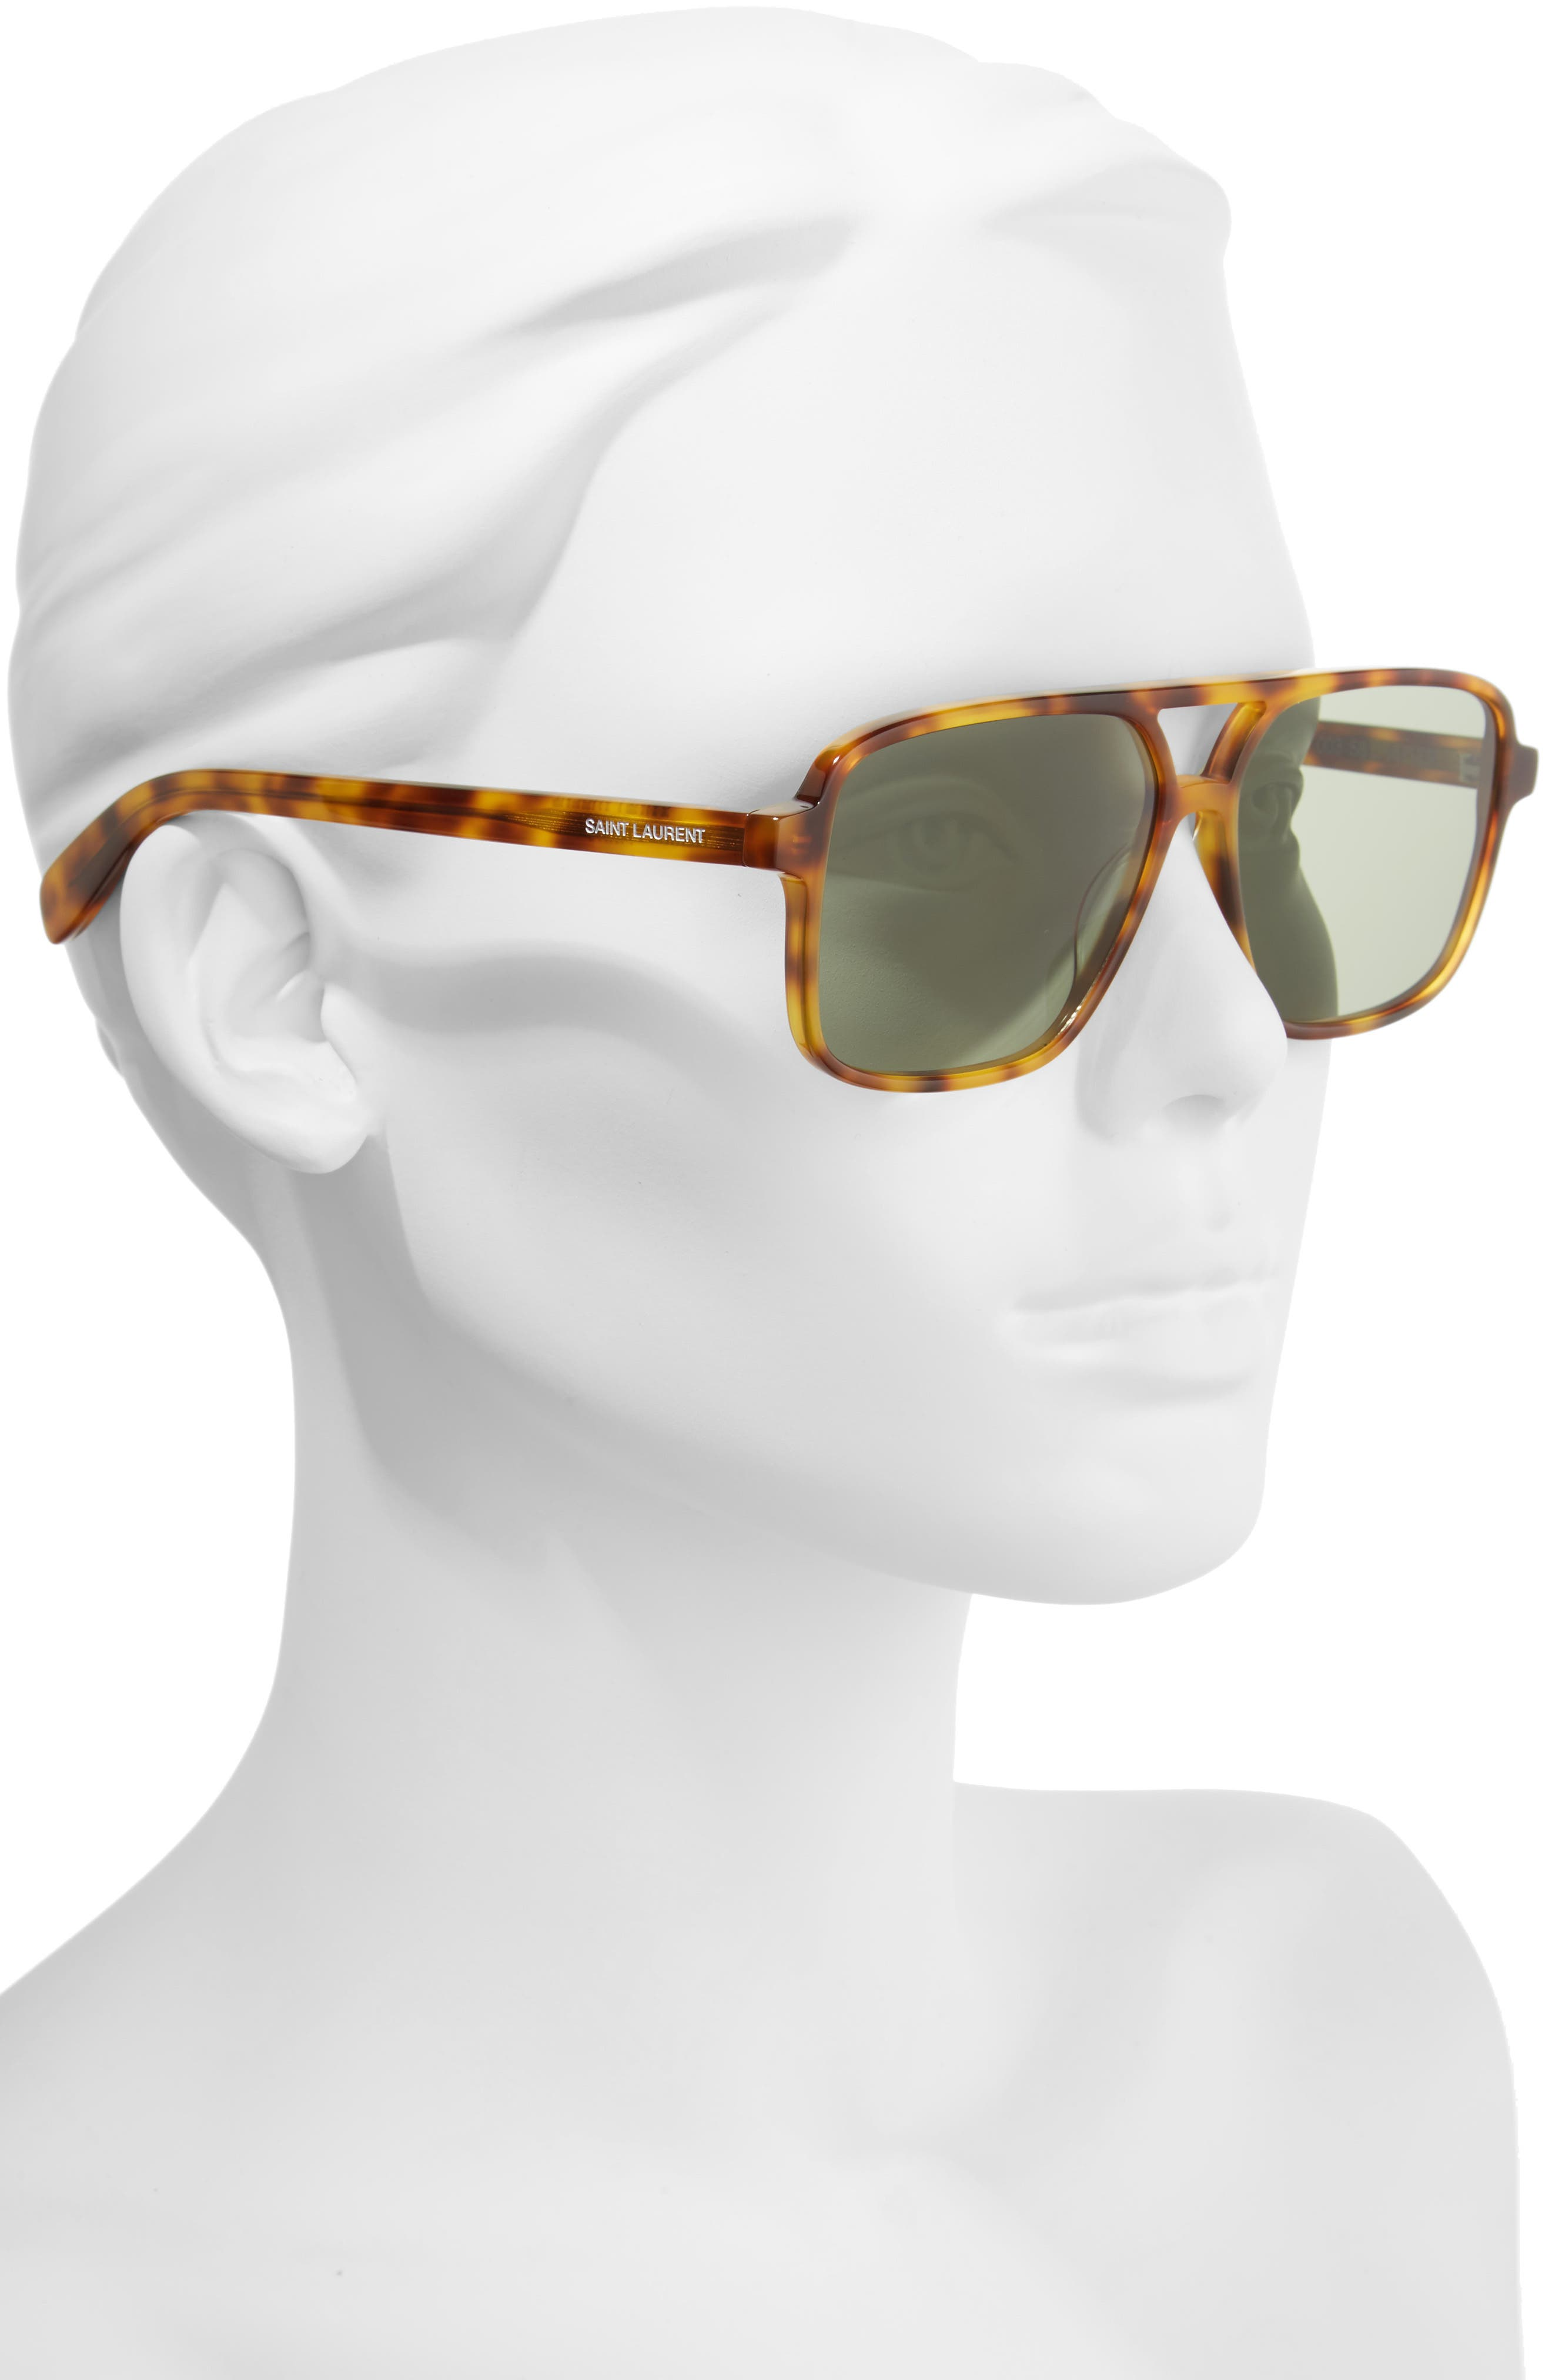 58mm Square Navigator Sunglasses,                             Alternate thumbnail 2, color,                             HAVANA/ HAVANA/ GREEN